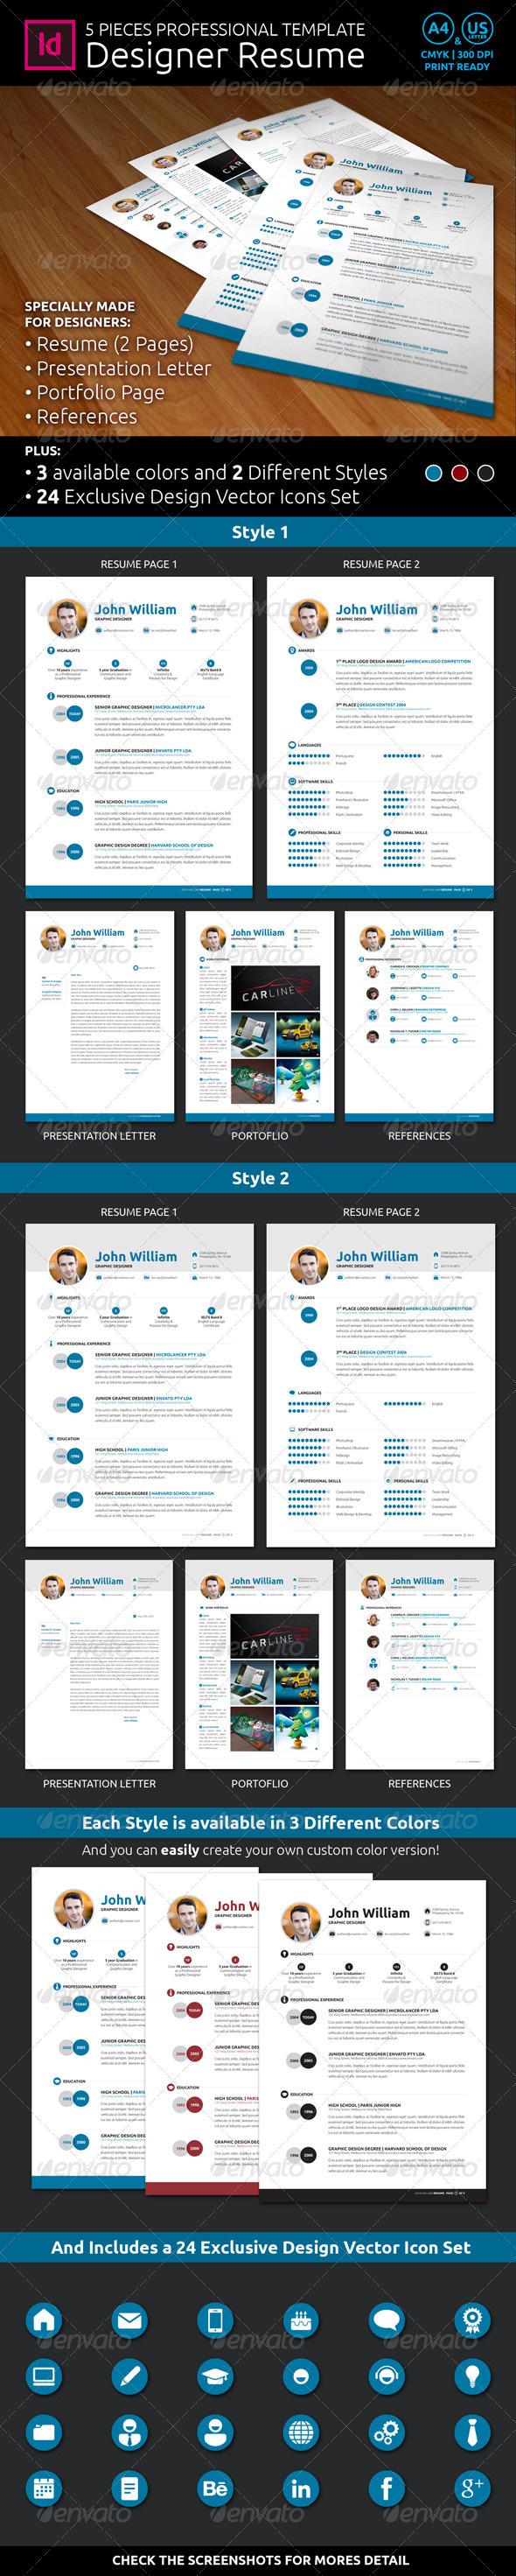 GraphicRiver Designer Resume CV Template 7822411